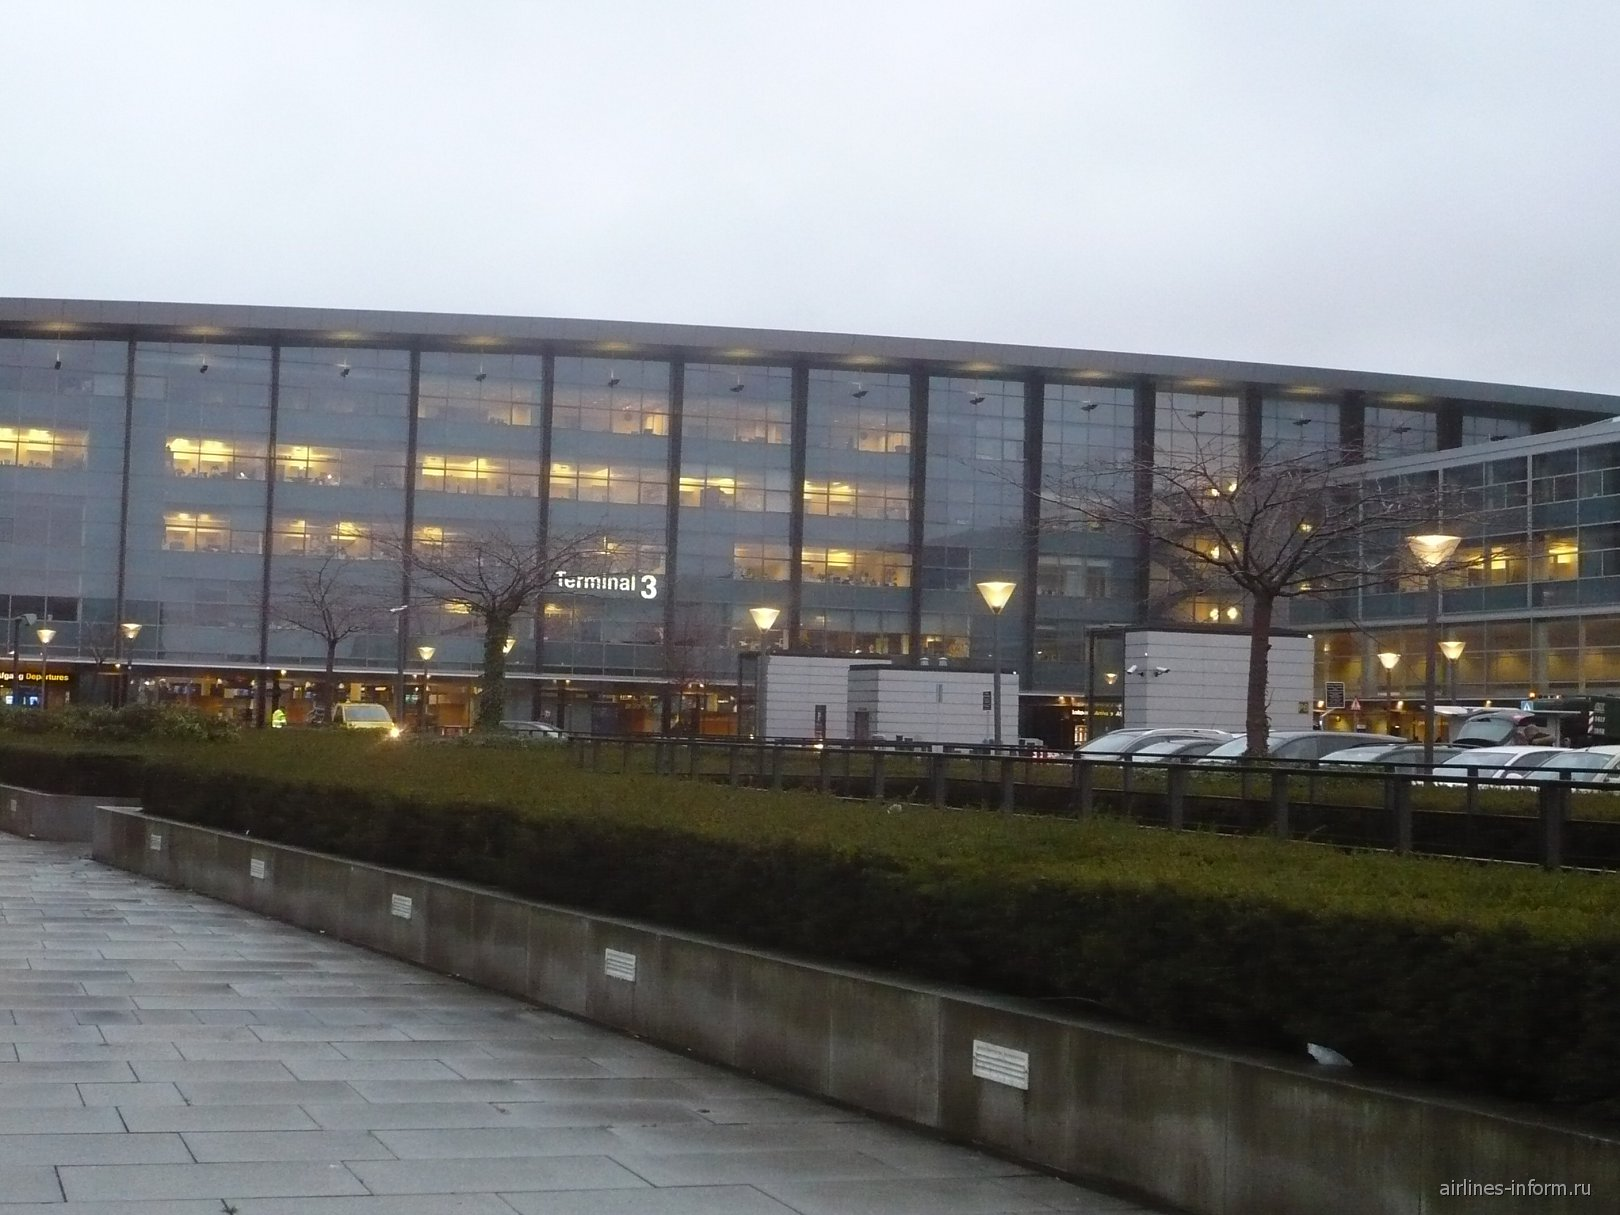 Терминал 3 аэропорта Копенгаген Каструп